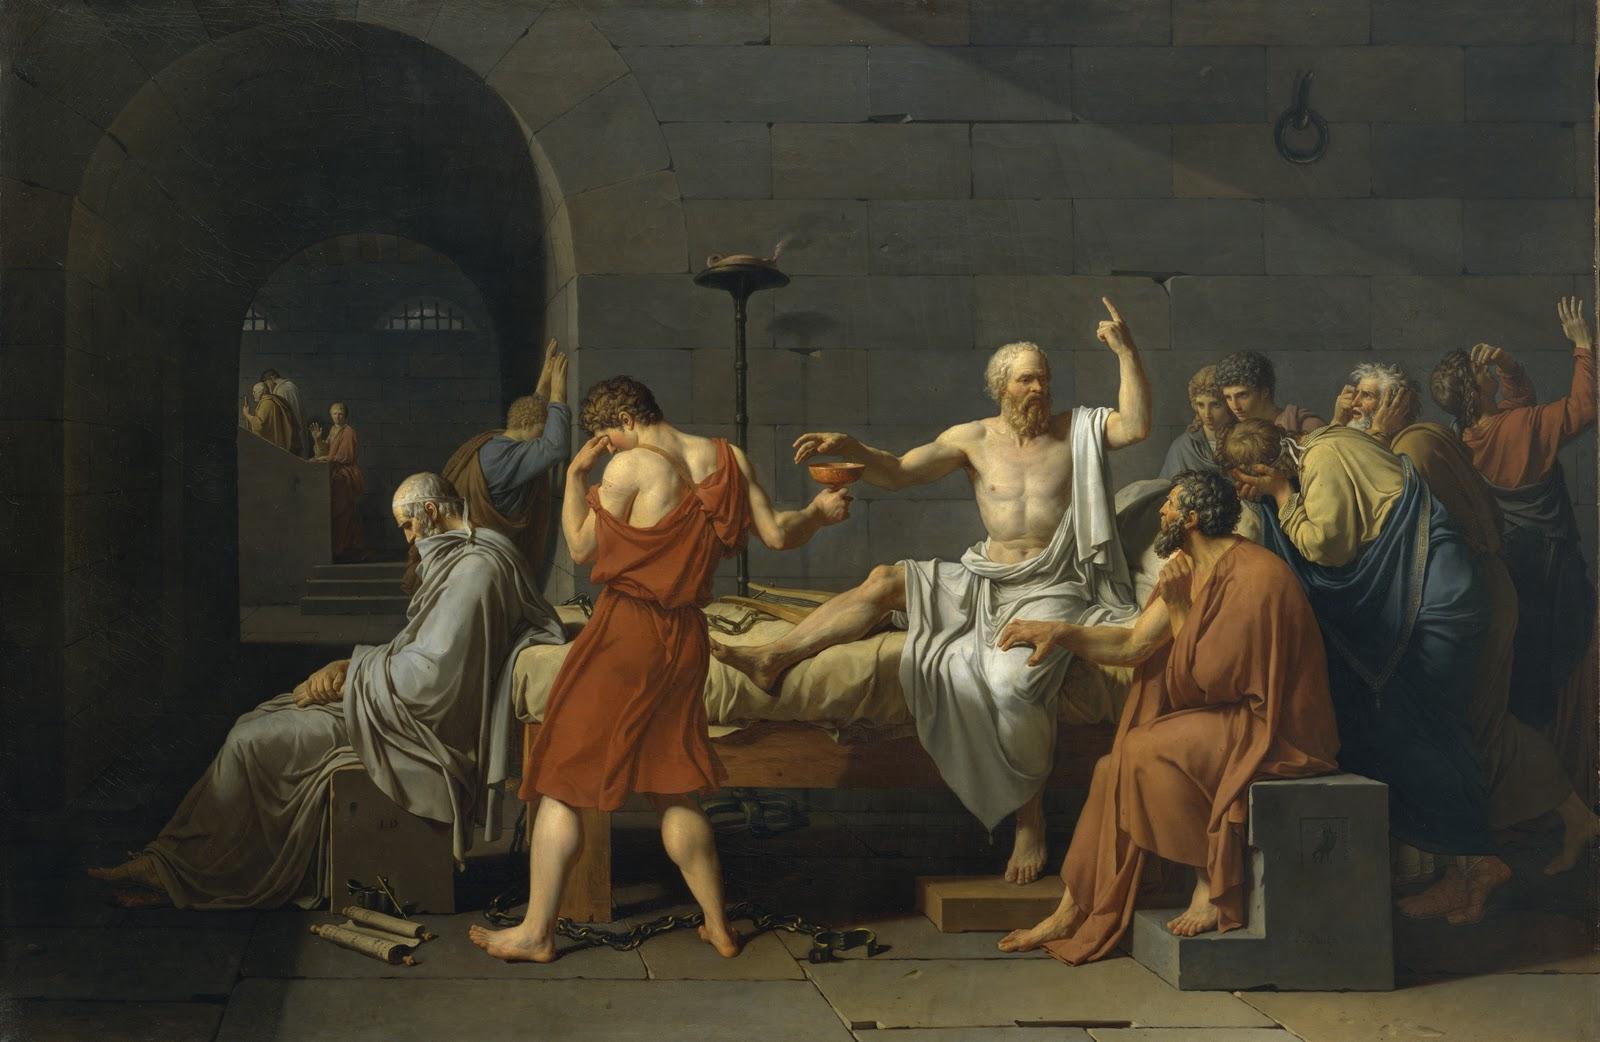 La morte di Socrate, Jacques-Louis David, 1787, olio su tela,129,5×196,2 cm, Metropolitan Museum of Art, New York